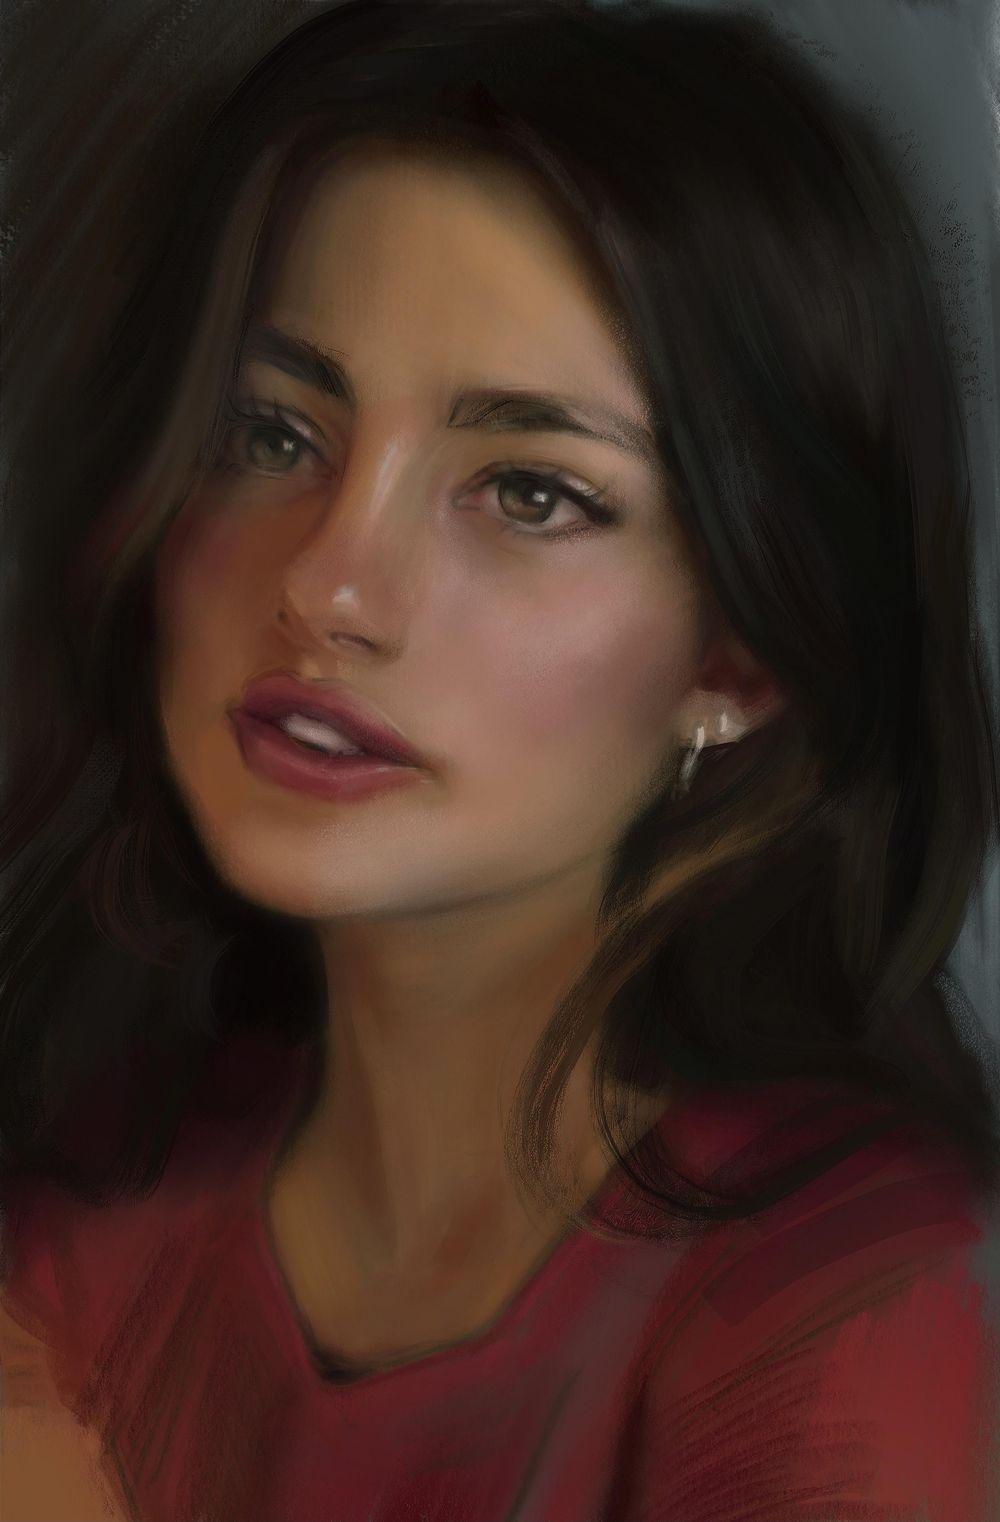 Portraits - image 24 - student project